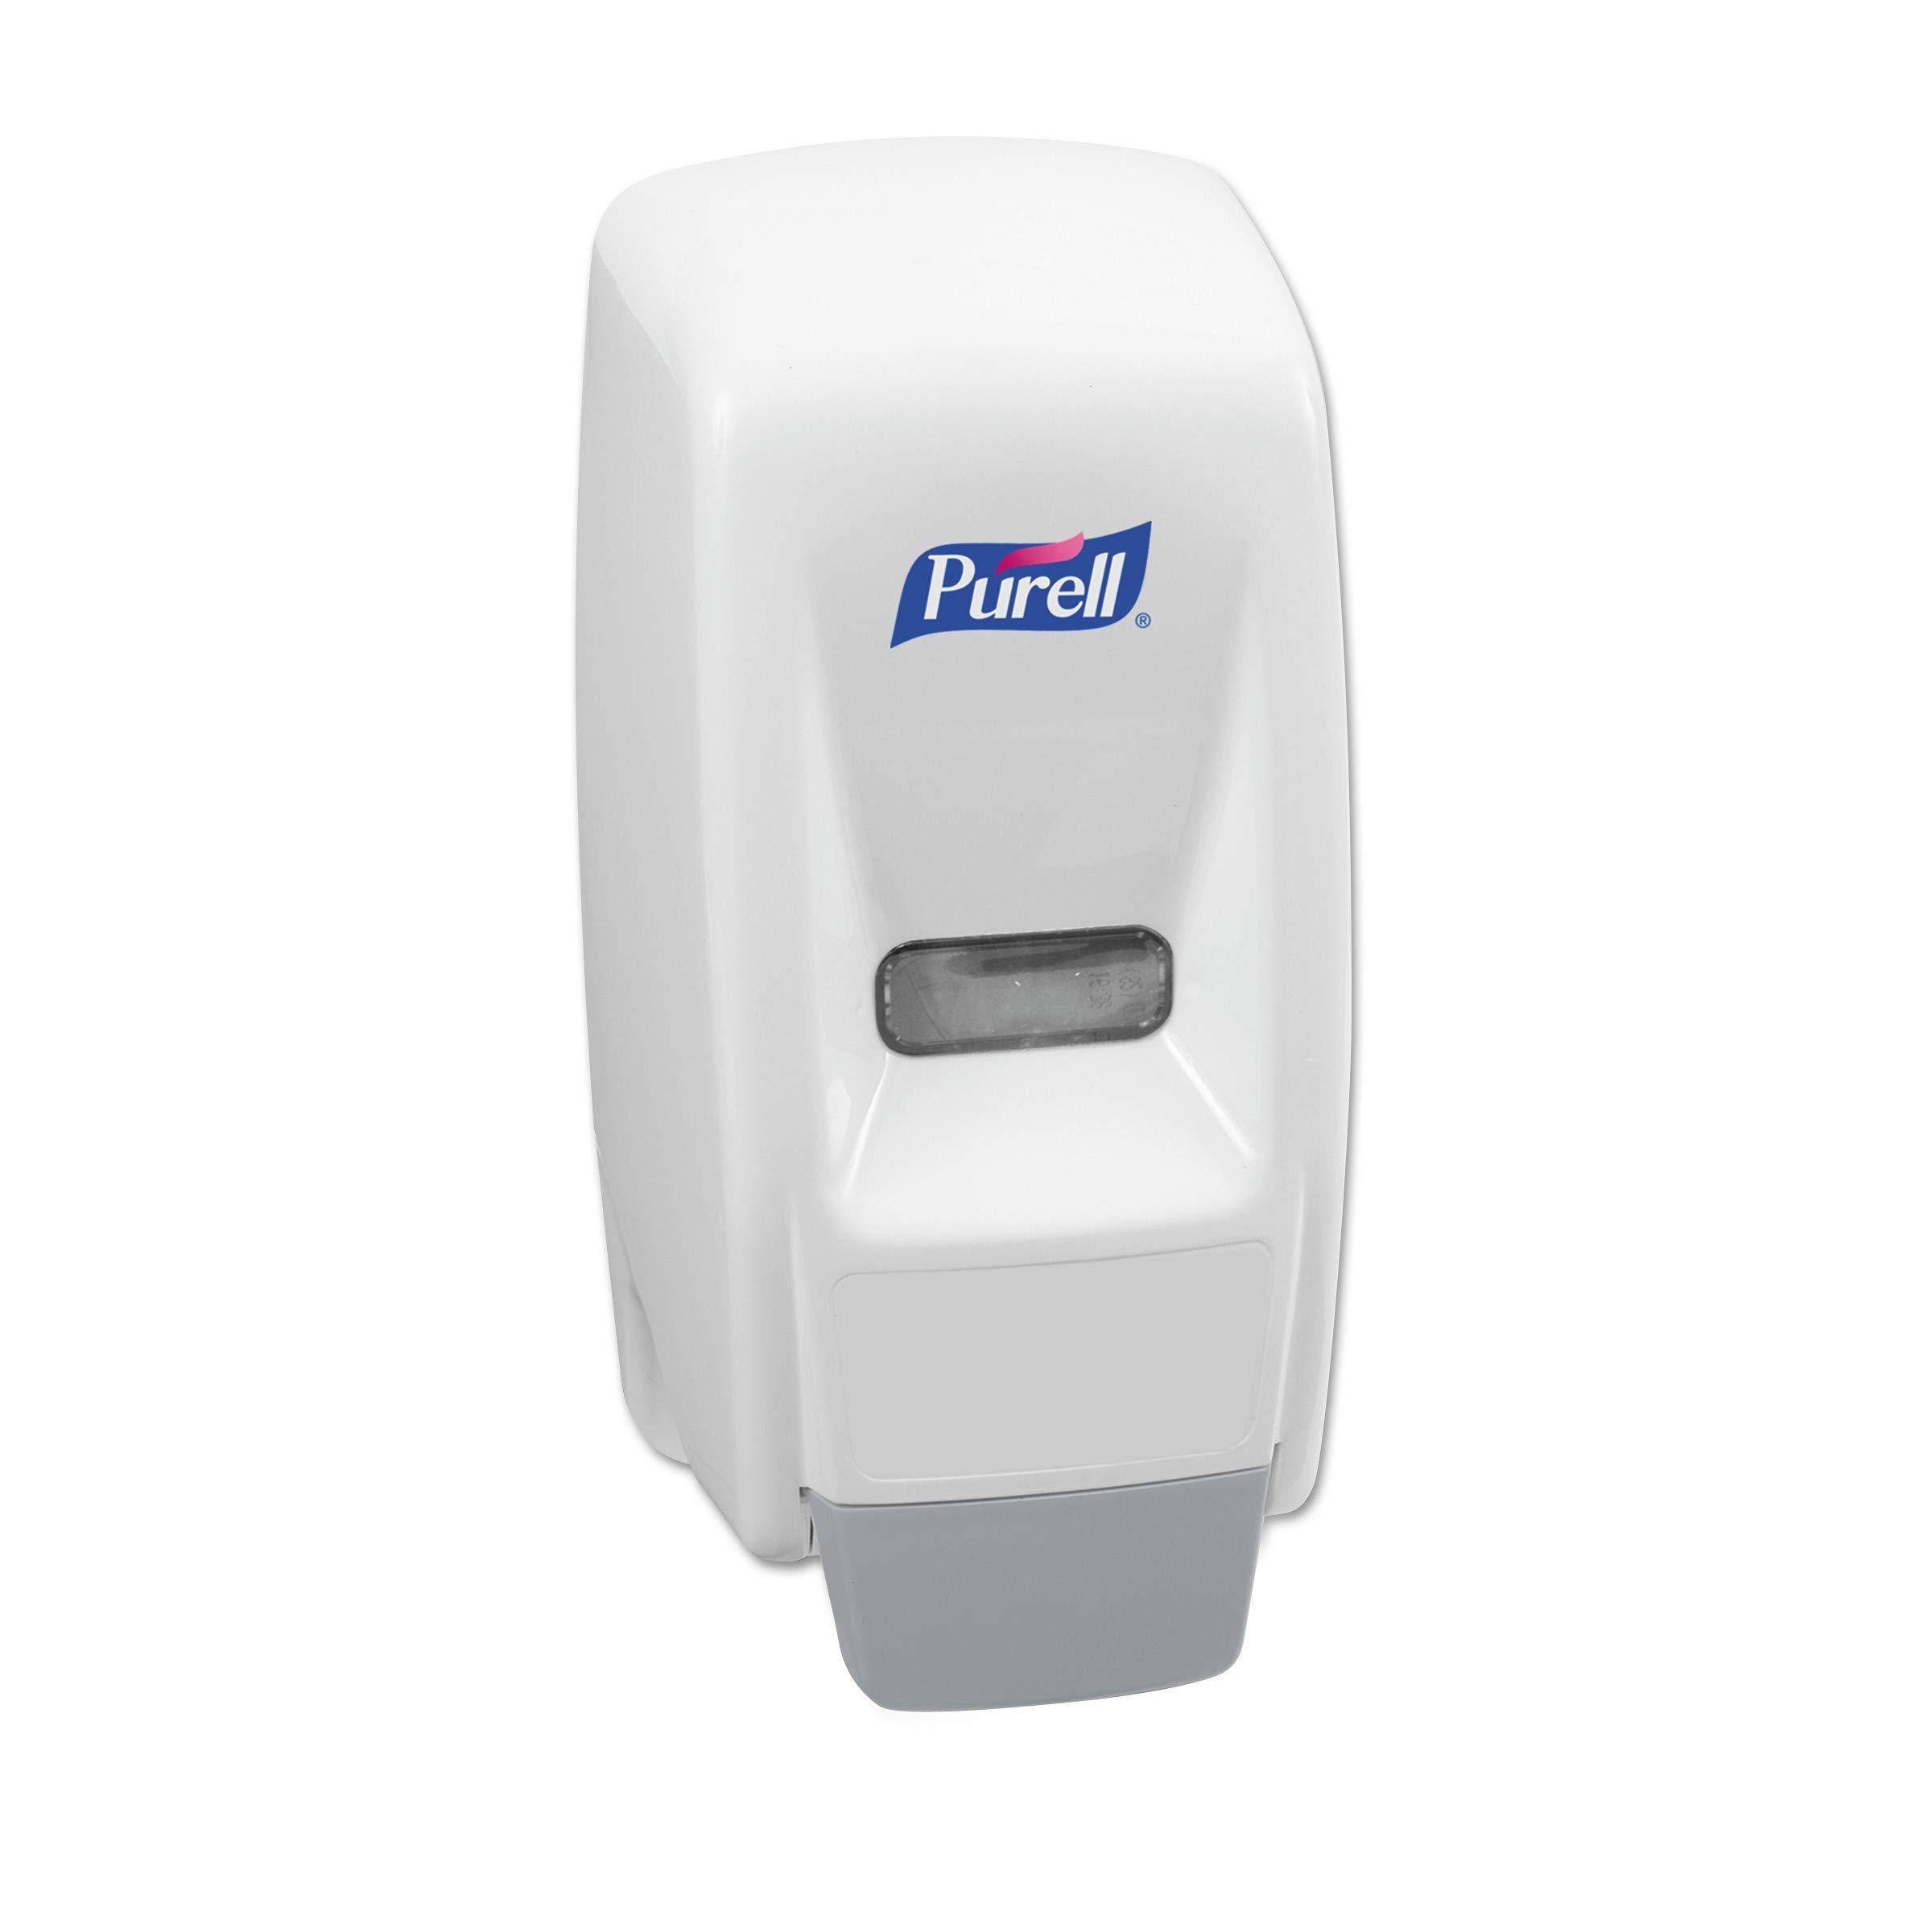 PURELL 800 Series Bag-In-Box Hand Sanitizer Push-Style Dispenser, Dispenser for 800 mL Sanitizer Bag-in-Box Refills - 9621-12